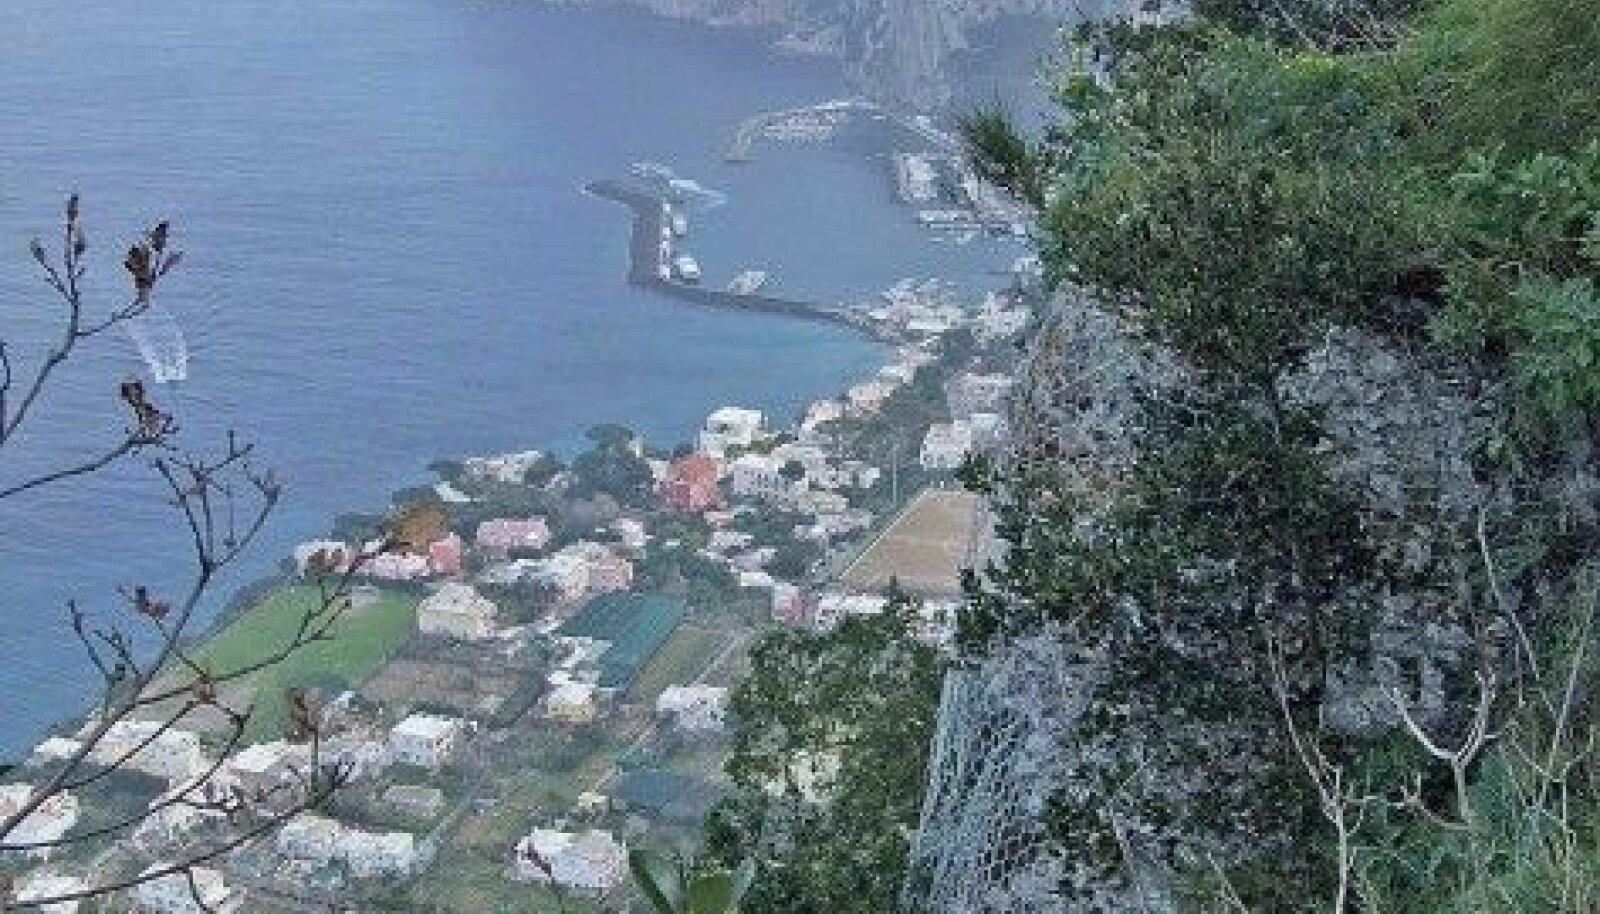 Anacaprilt naastes haigutab bussi akna taga kuristik. All Capri sadam. Foto: Toivo Tomingas